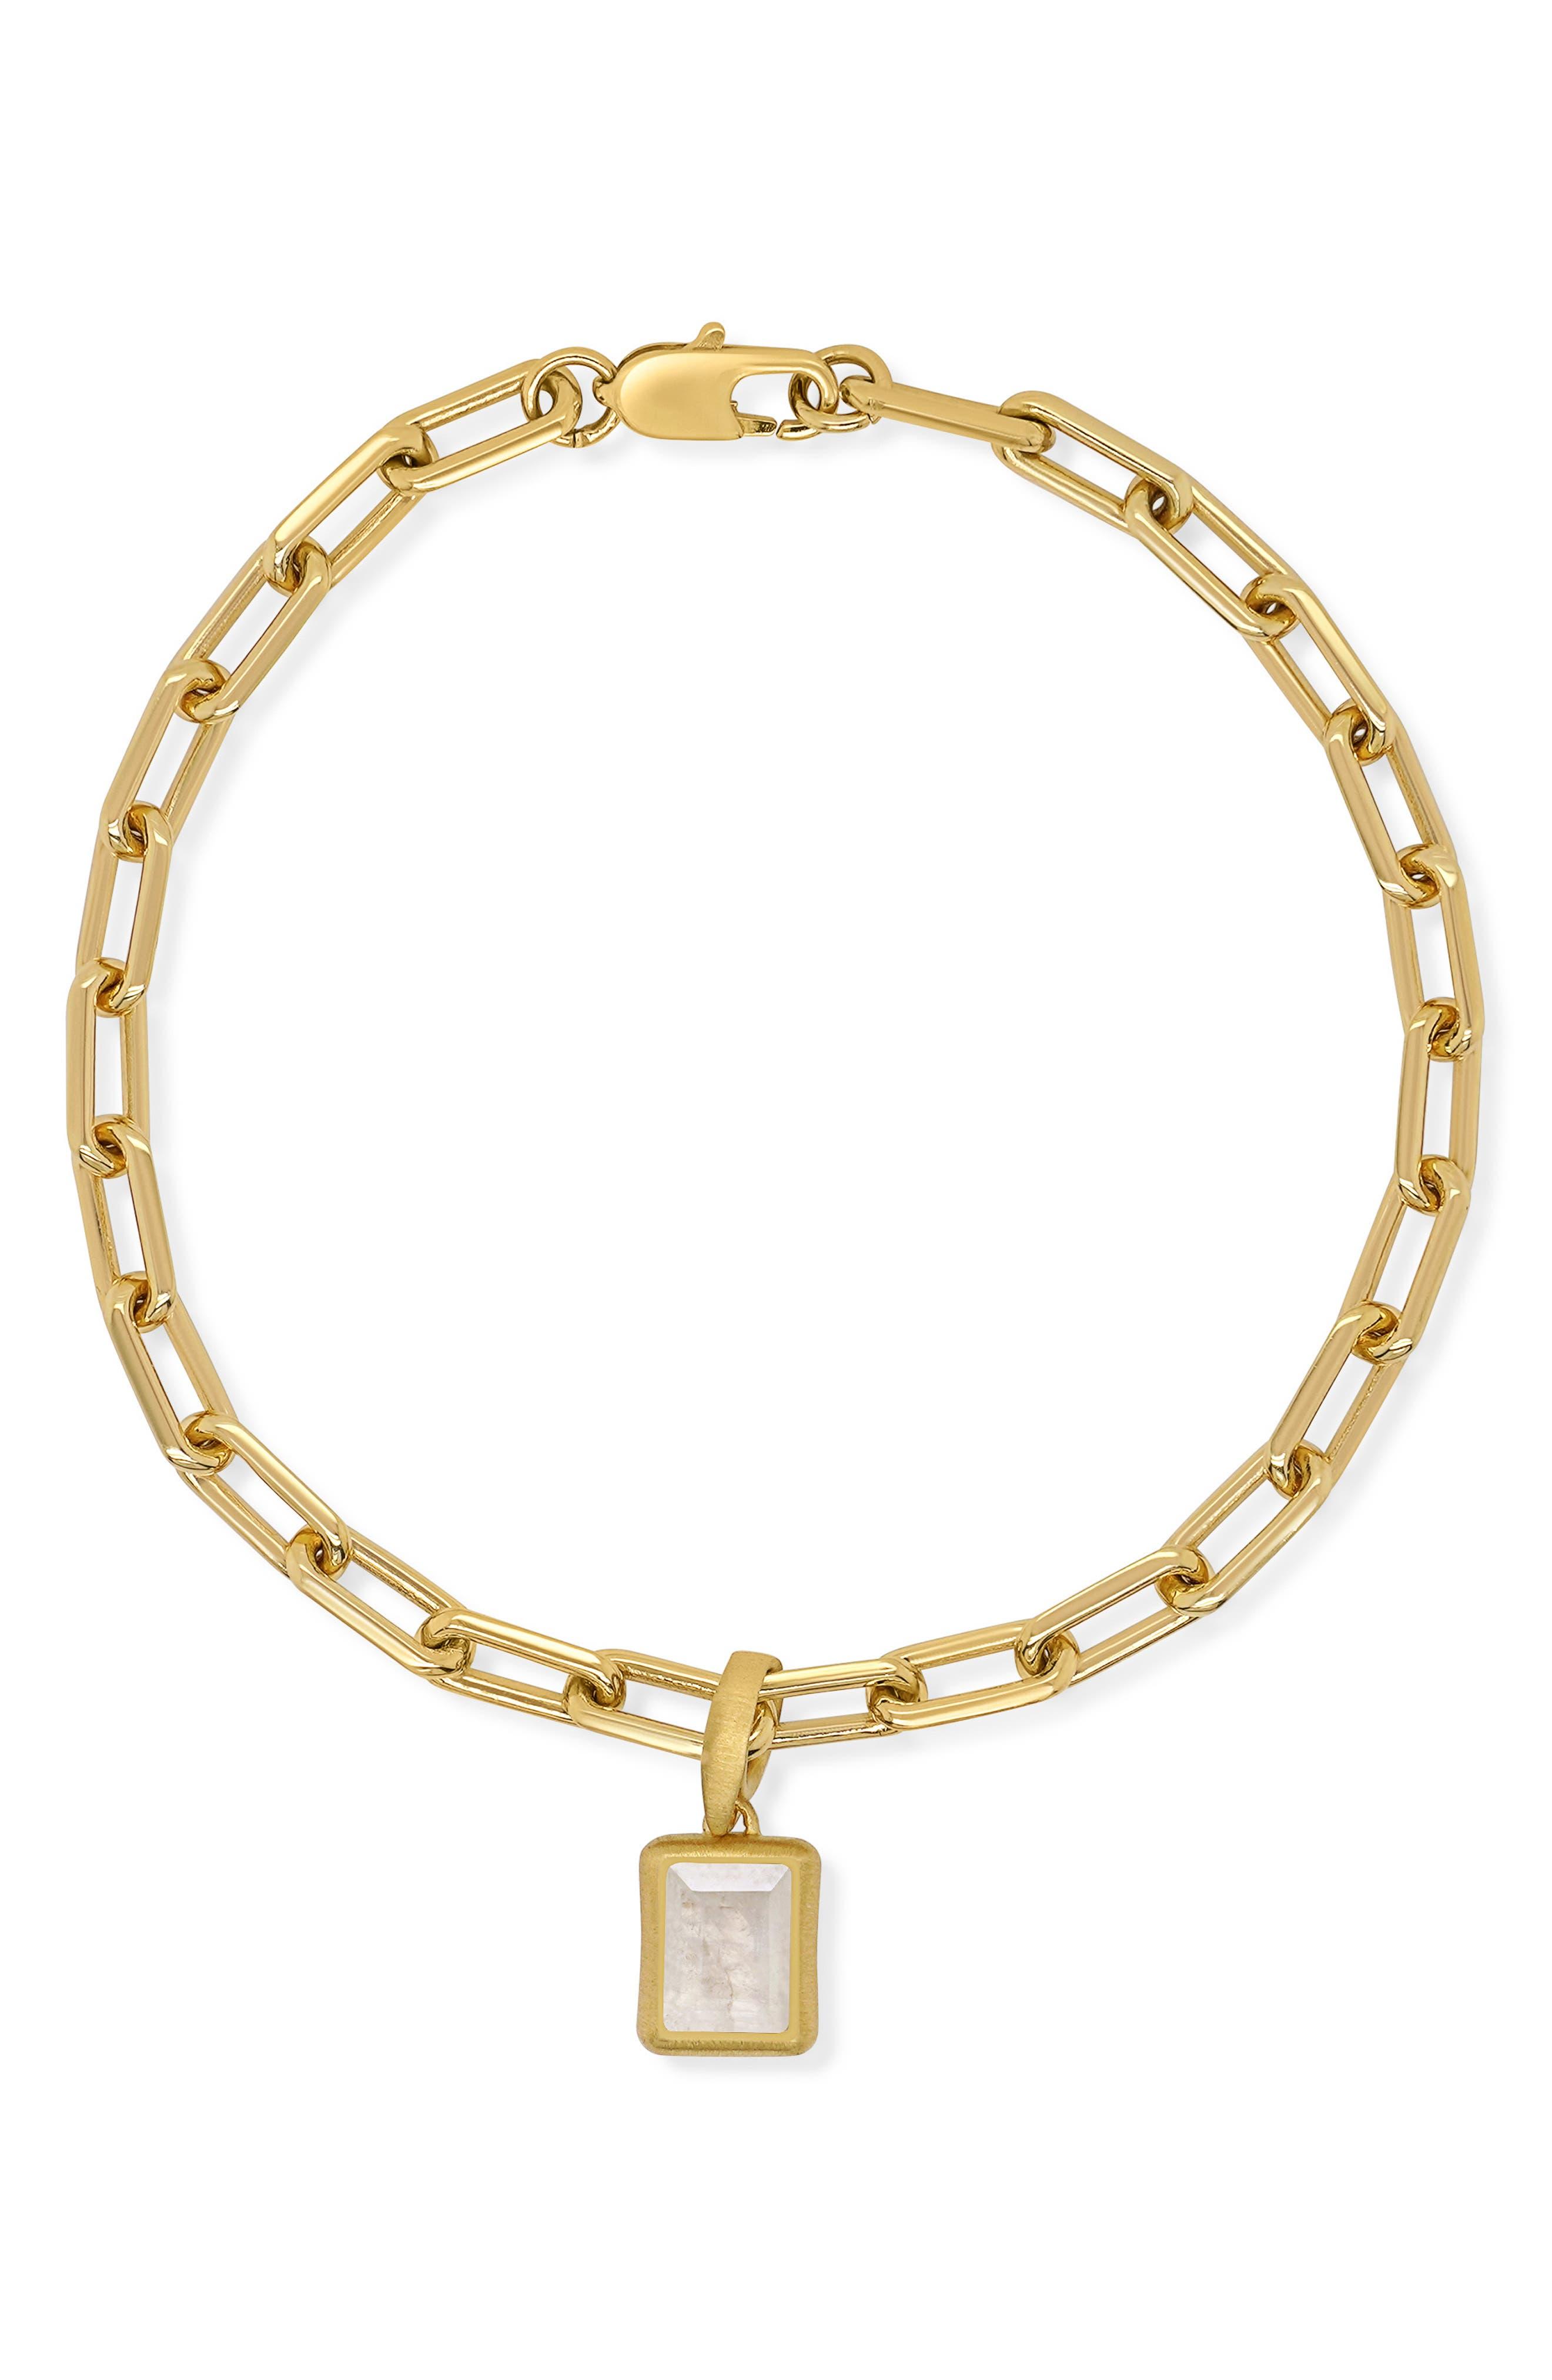 Baguette Moonstone Pendant Bracelet